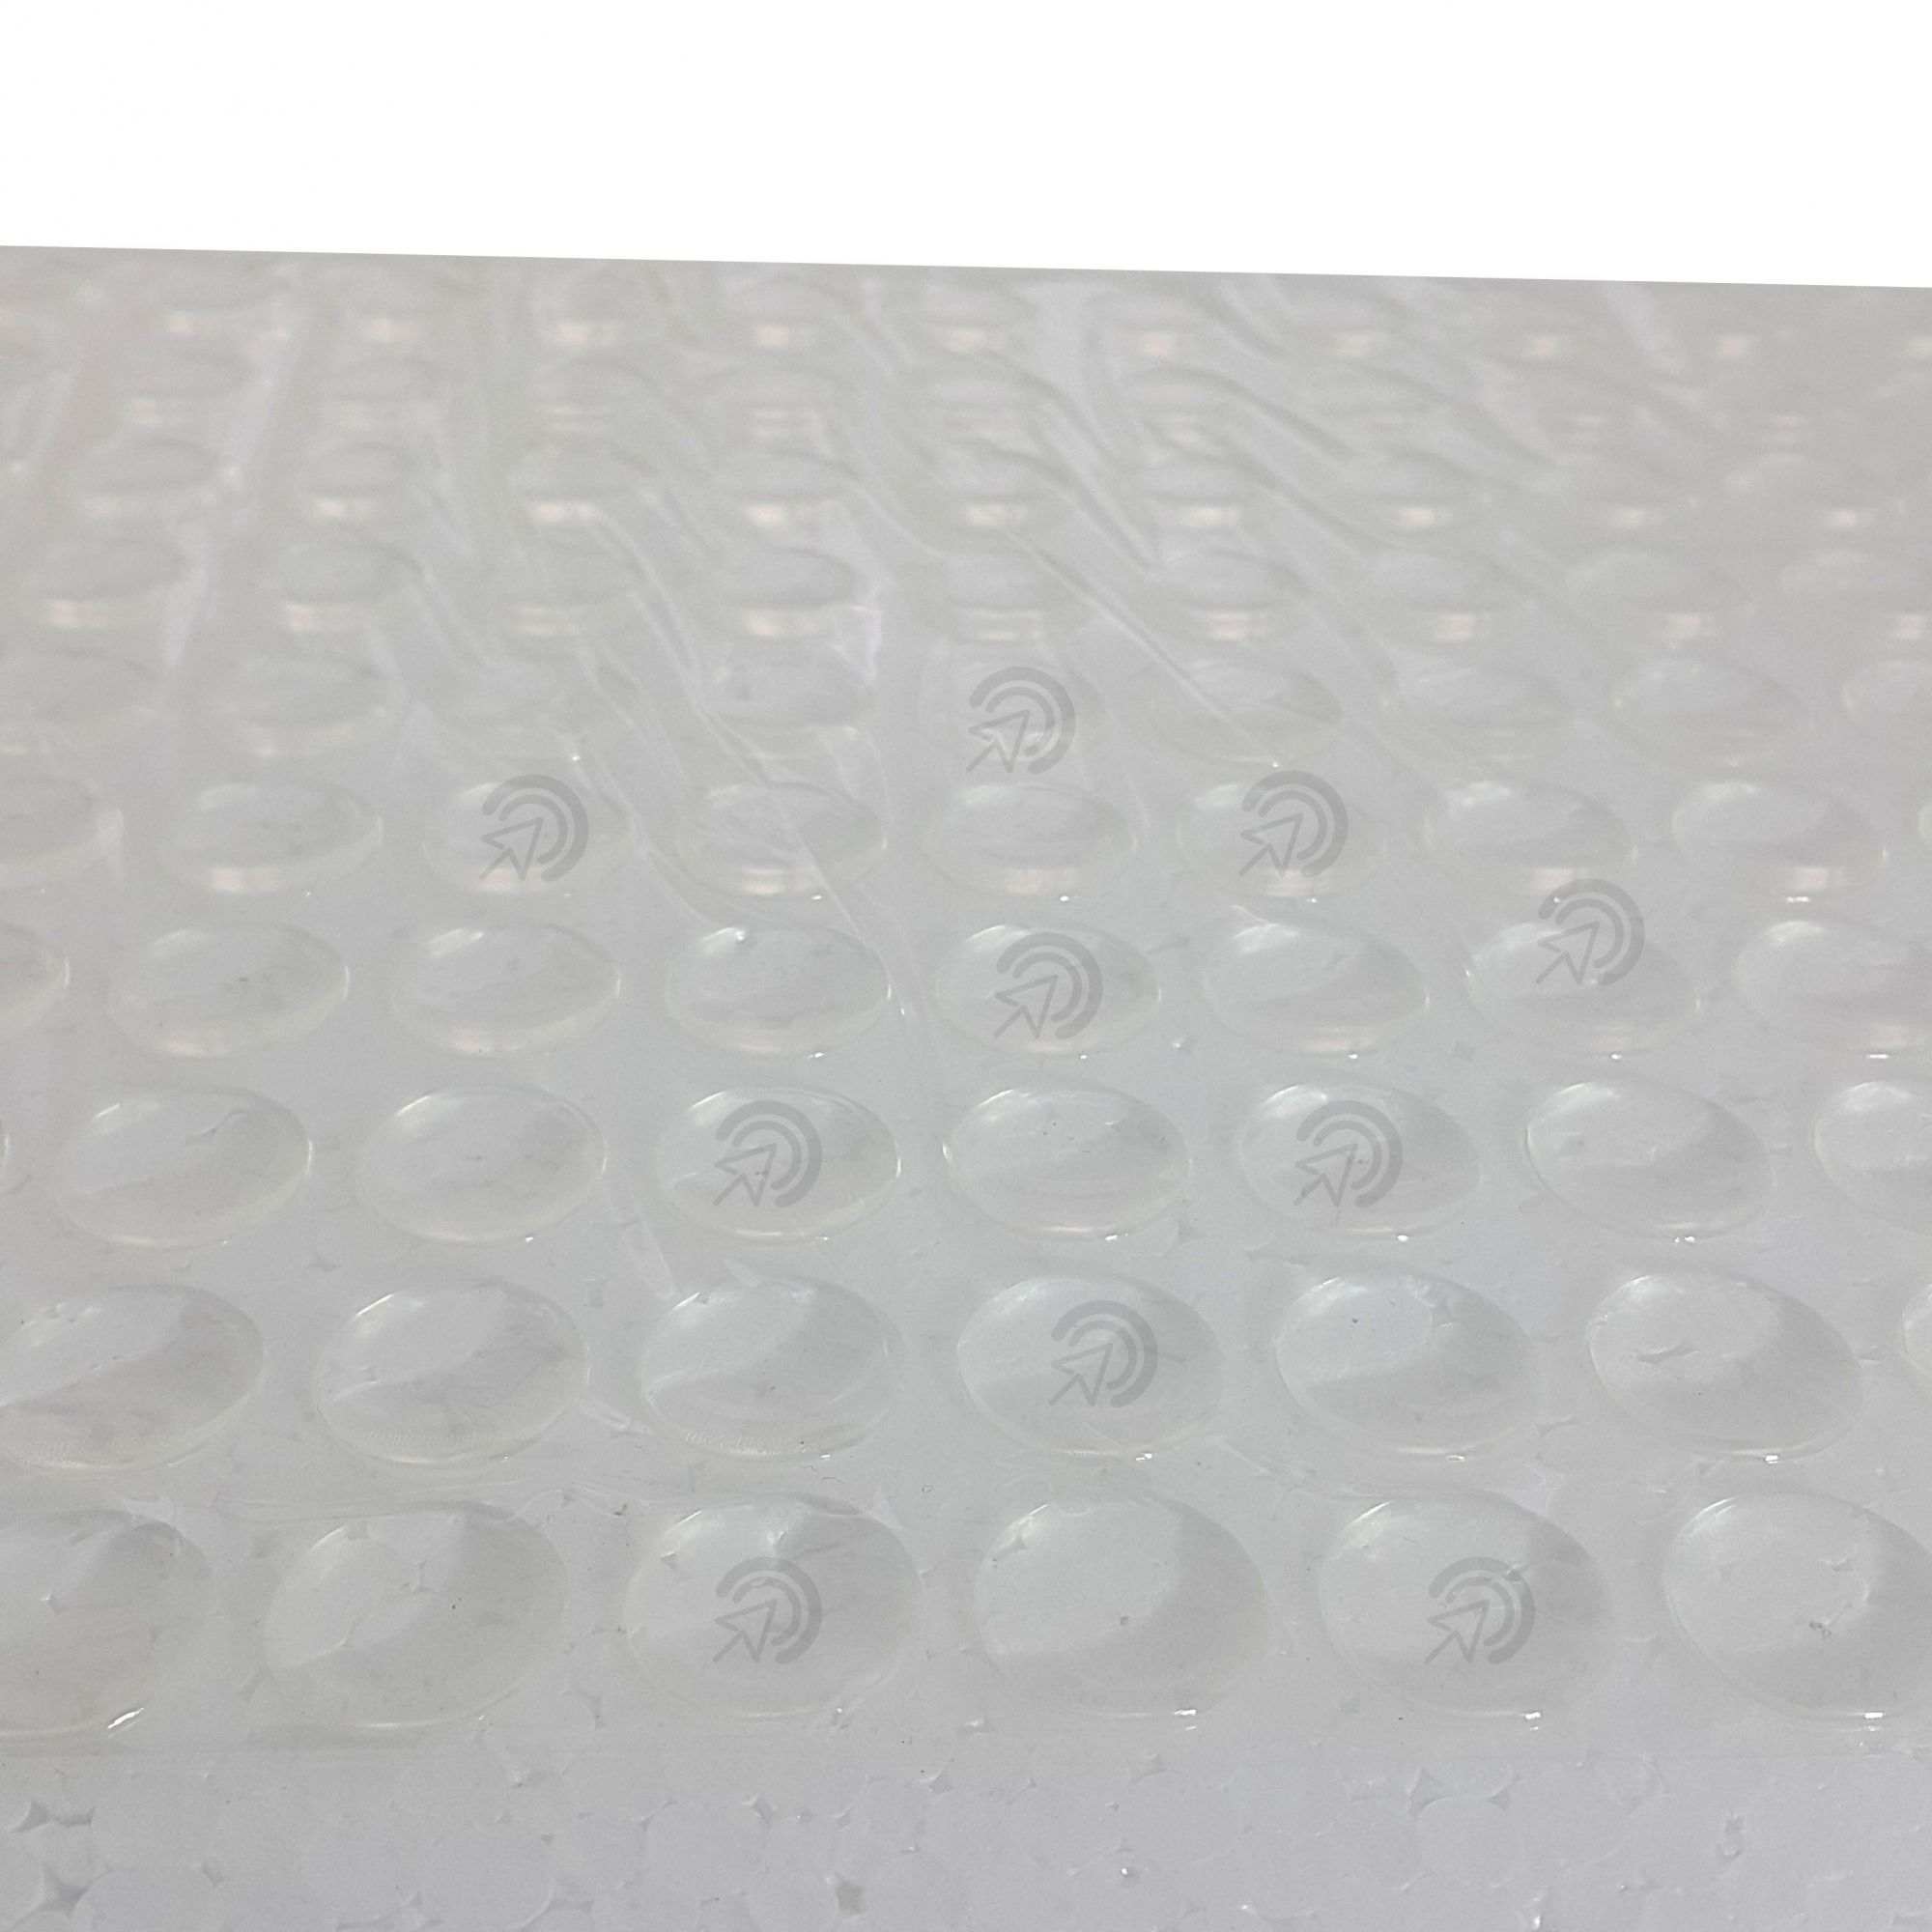 Protetor Batente De Silicone Redondo 15mm Multiuso Com Cola (gotas De Silicone)